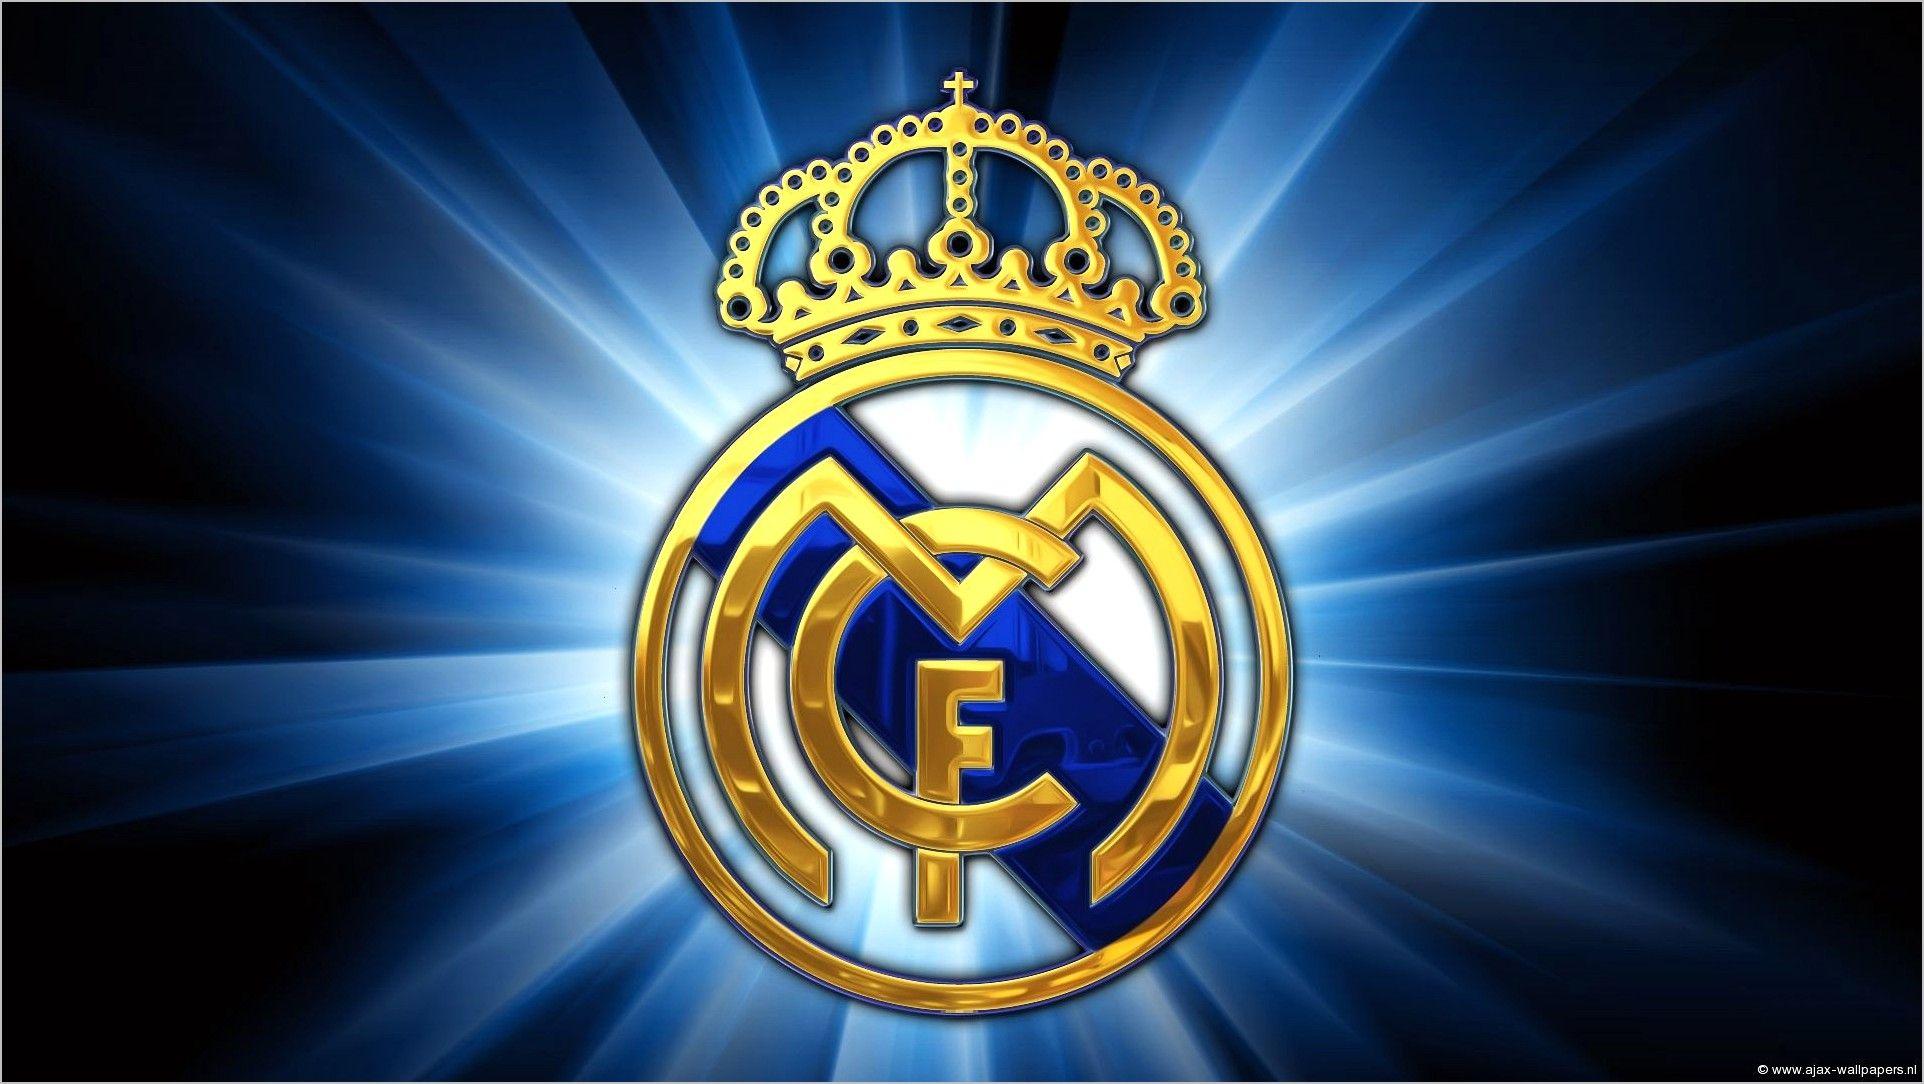 Real Madrid Wallpaper 4k 2017 Madrid Wallpaper Real Madrid Logo Wallpapers Real Madrid Logo